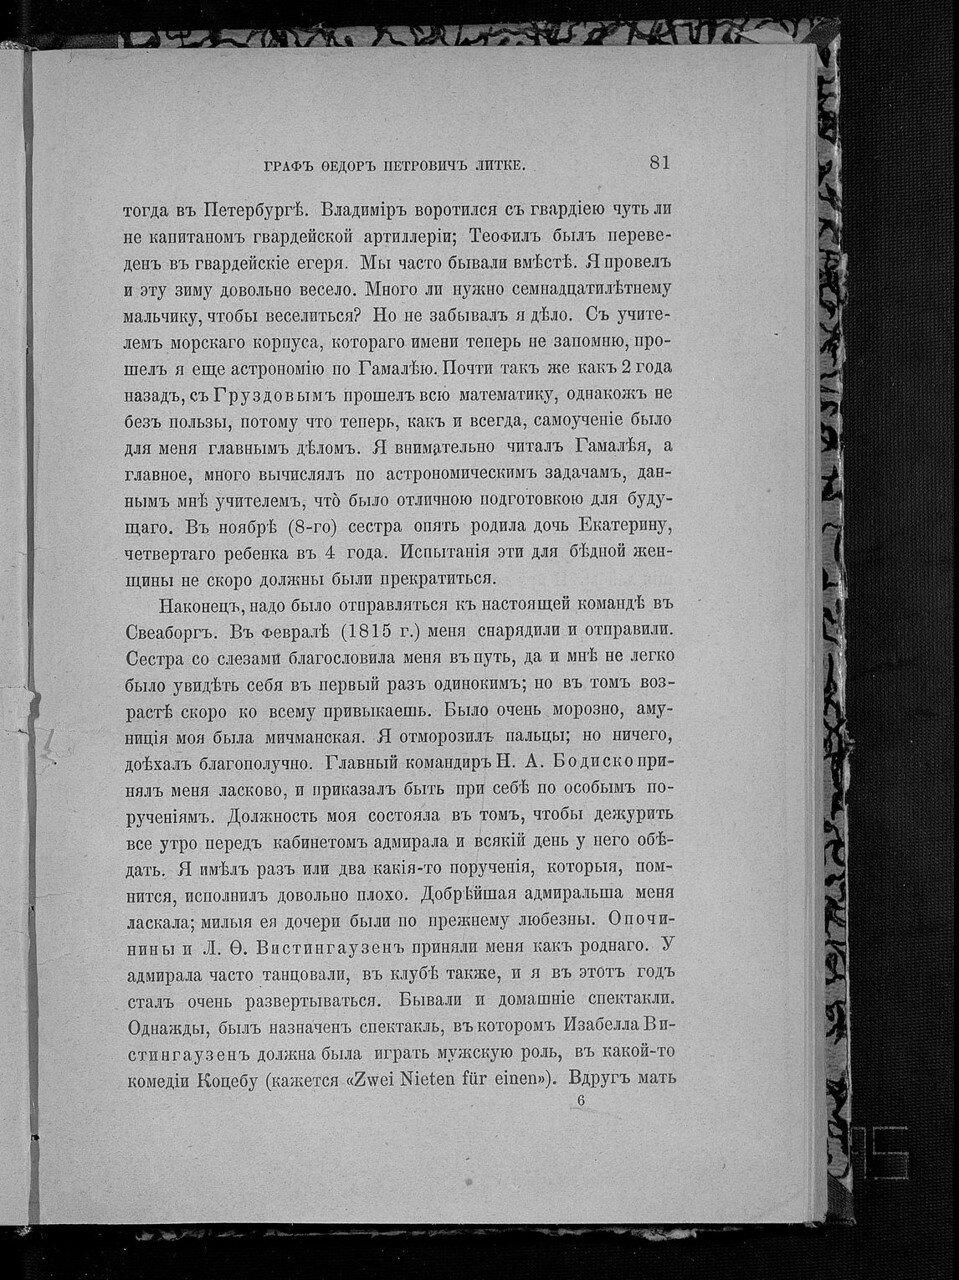 https://img-fotki.yandex.ru/get/875526/199368979.d4/0_21ddf1_b7efd0c1_XXXL.jpg